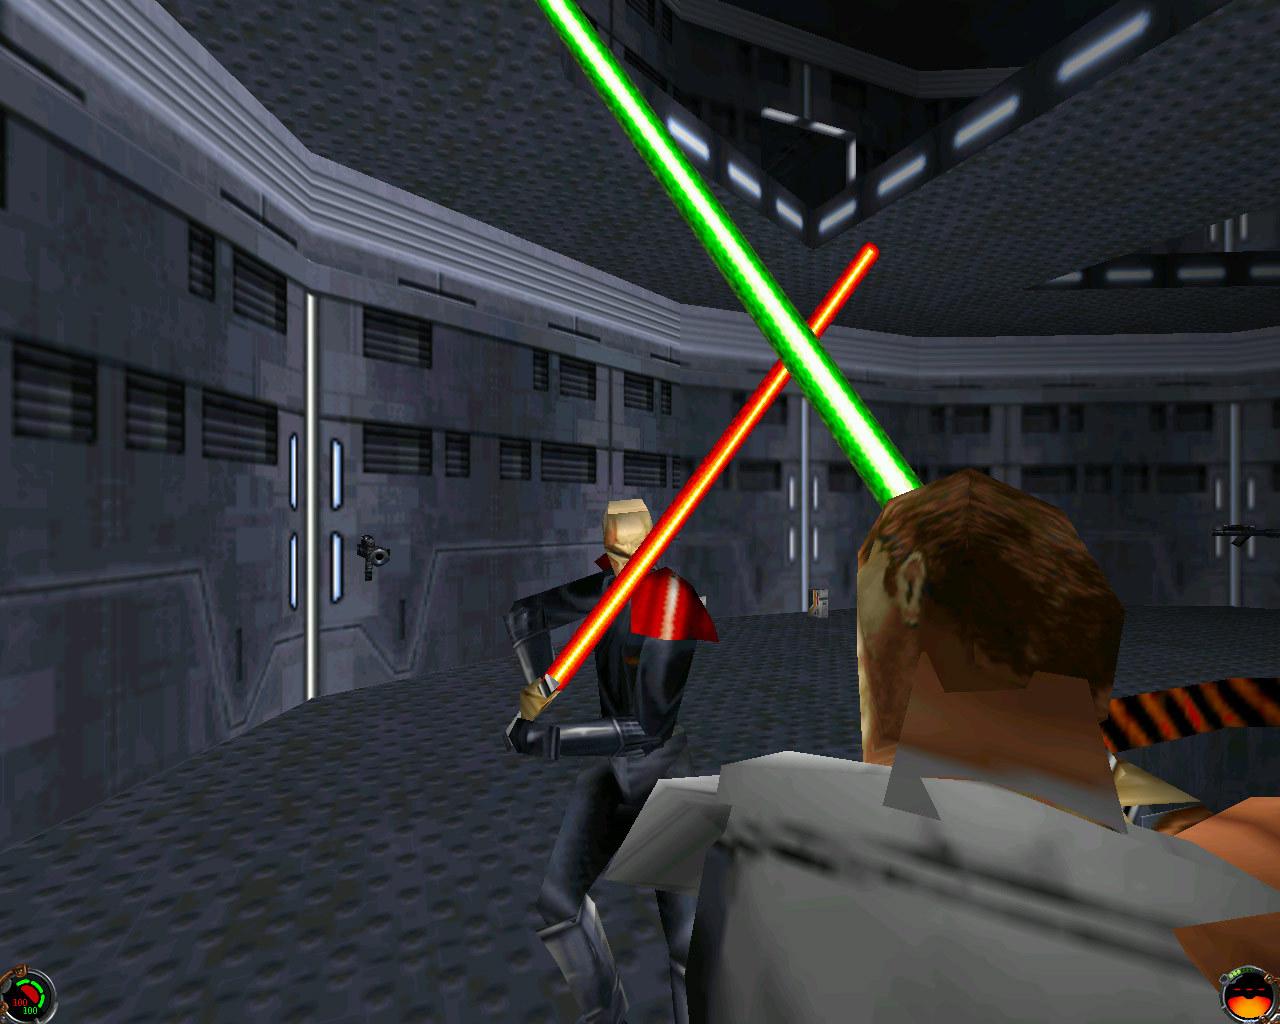 Download Star Wars Jedi Knight Dark Forces Ii Full Pc Game